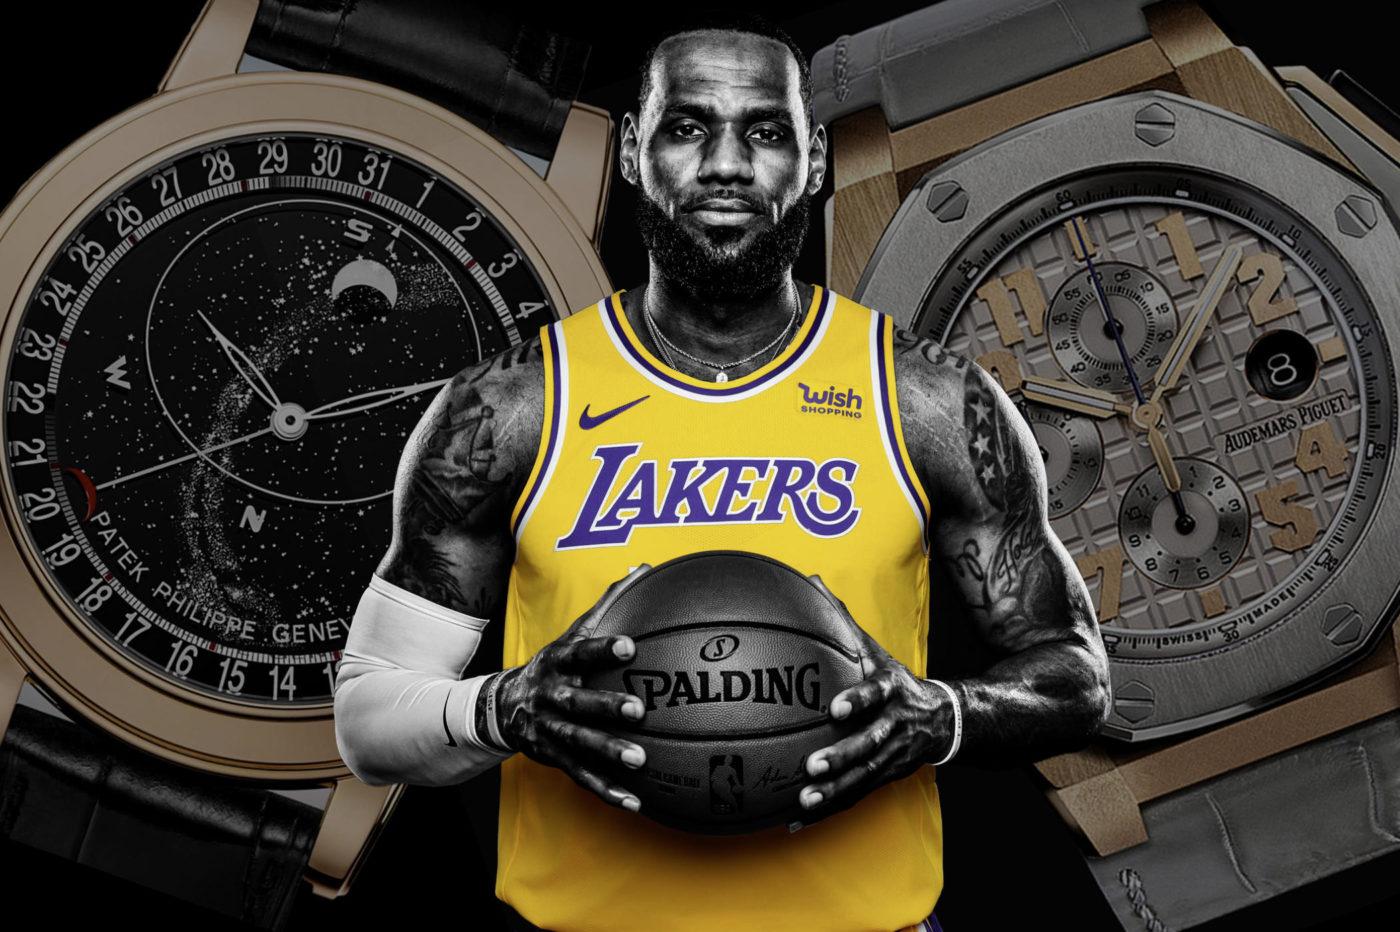 Timebloid Zegarki gwiazd NBA – LeBron James